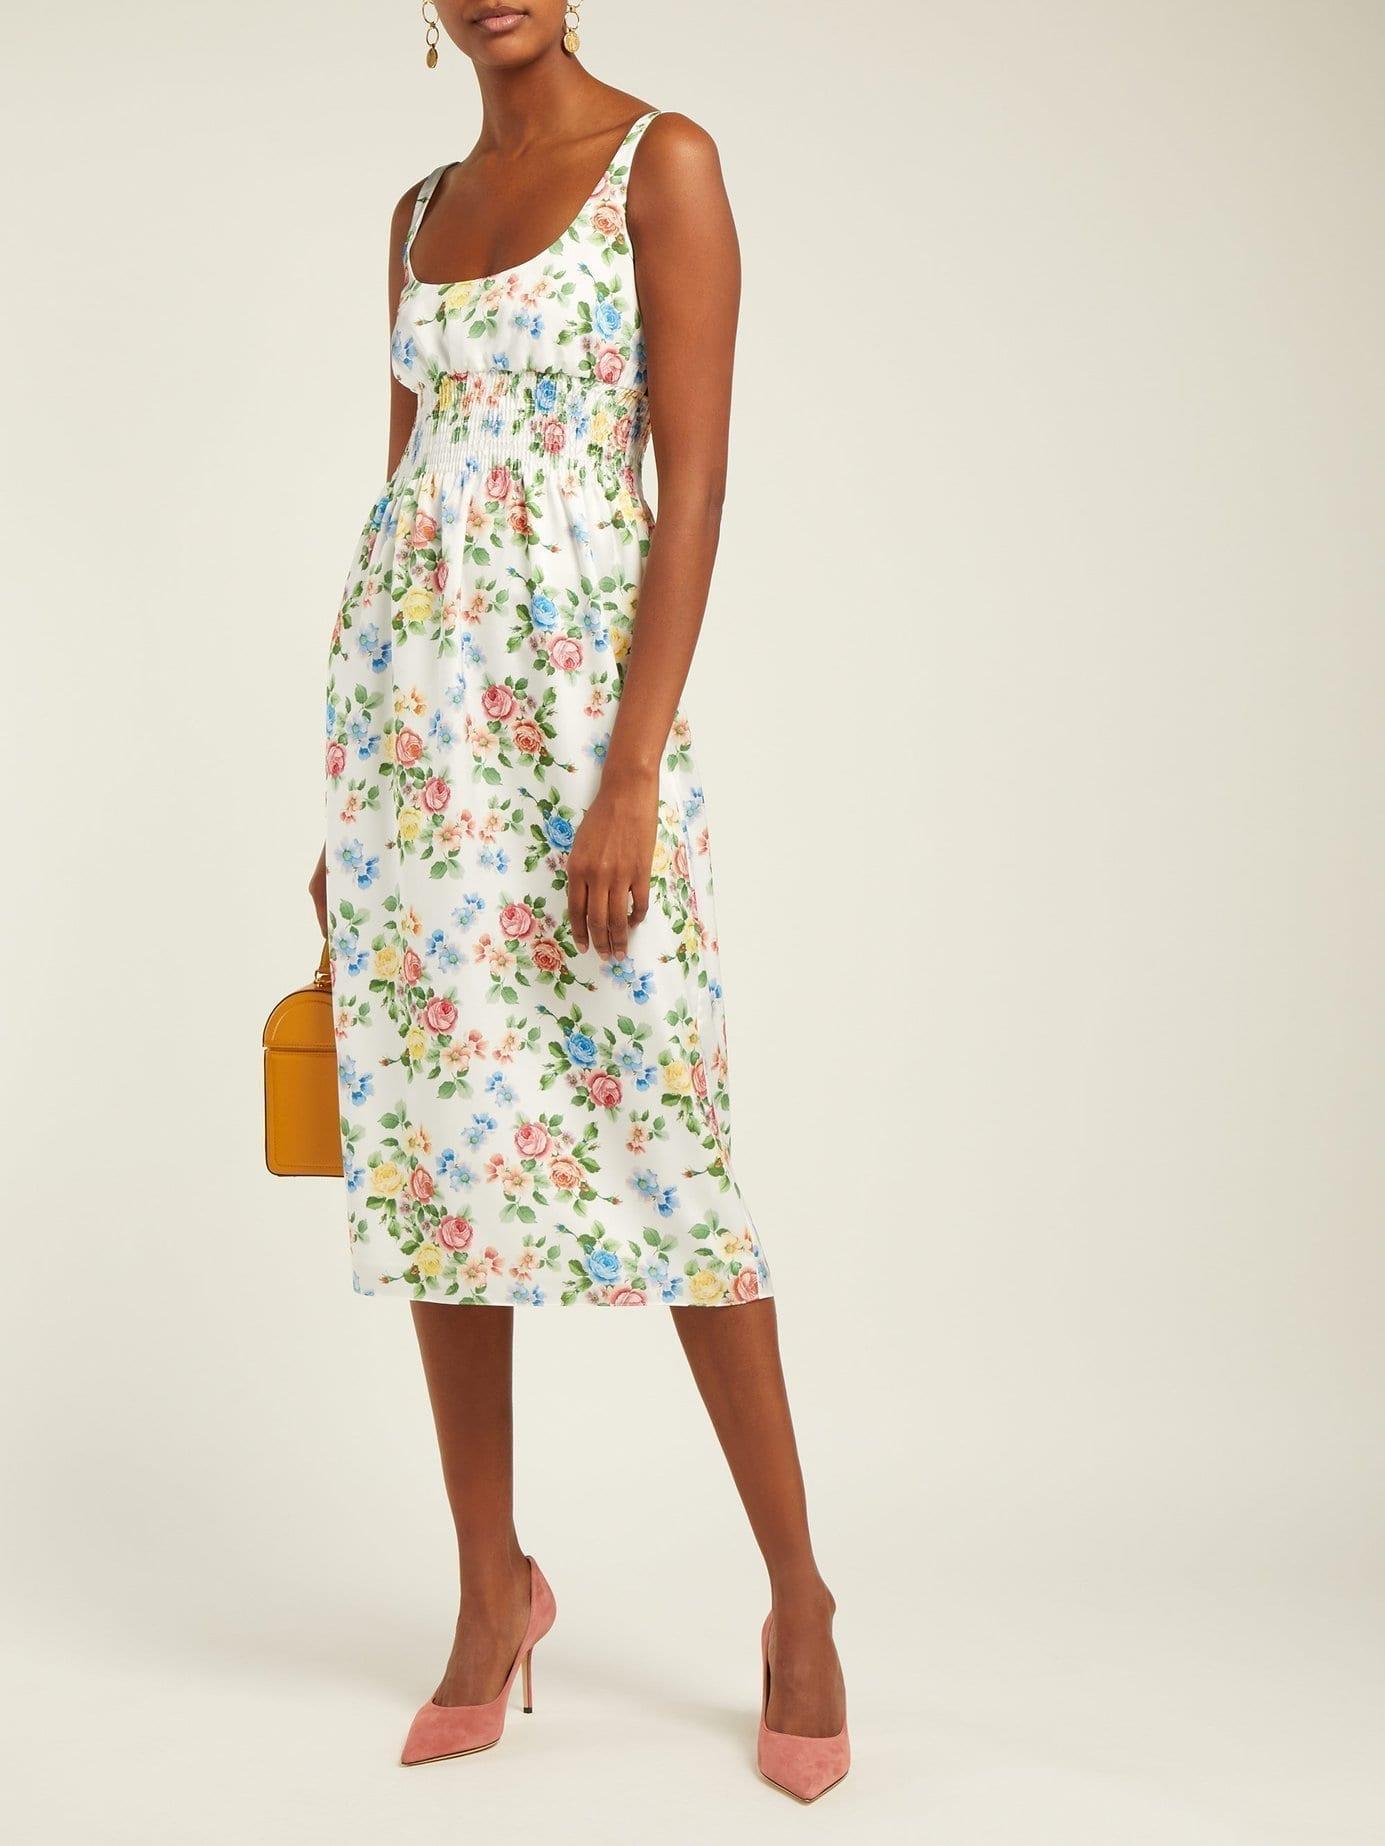 EMILIA WICKSTEAD Giovanna White / Floral Printed Dress